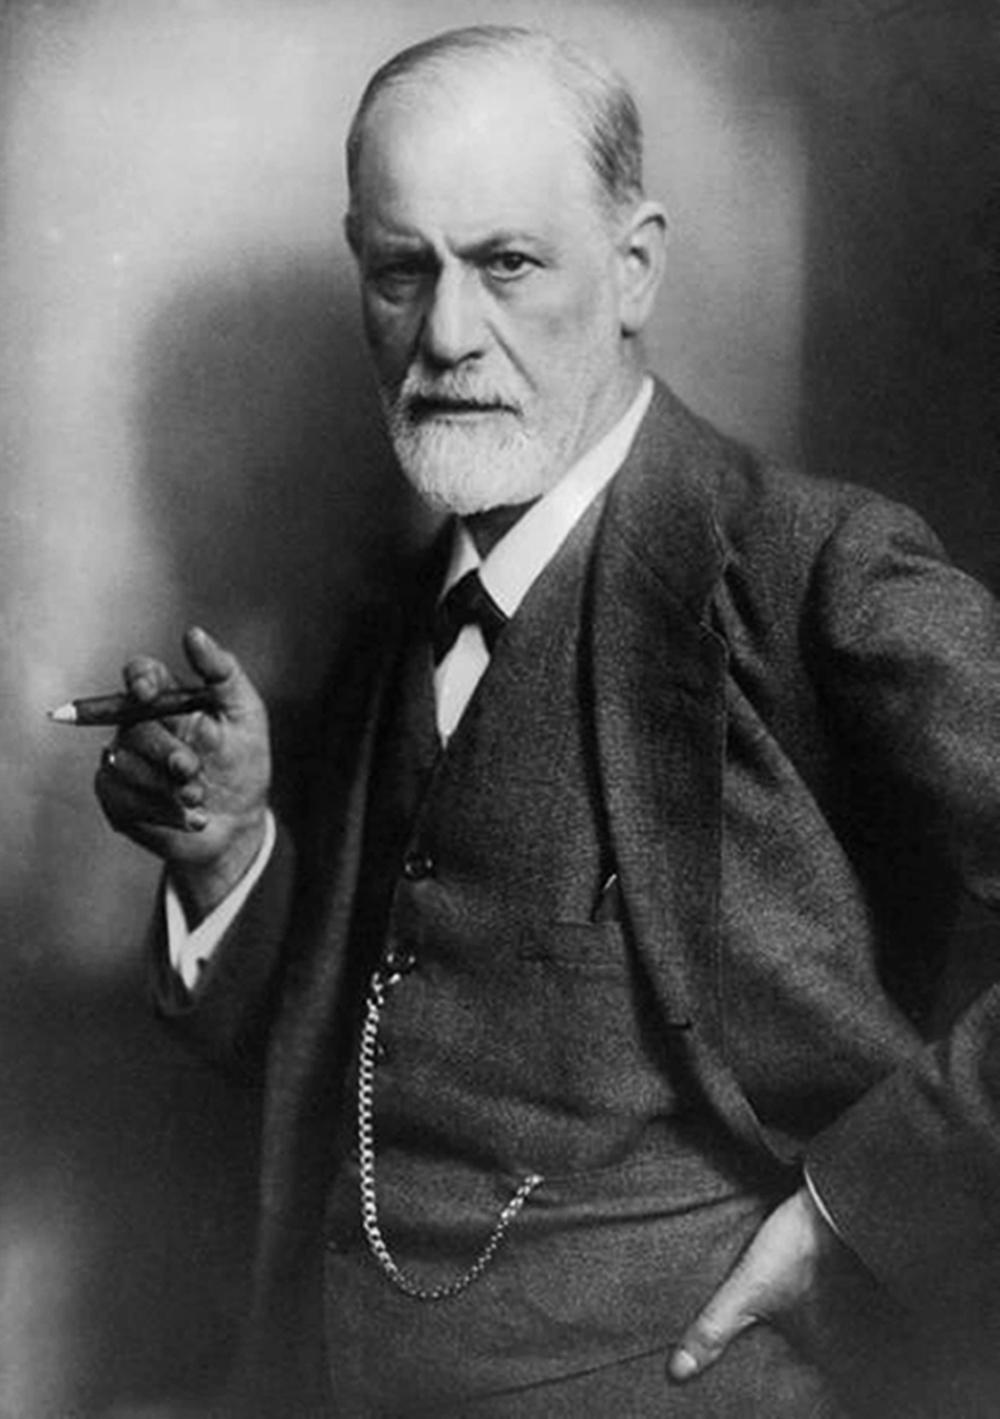 Uncle Sigmund Freud